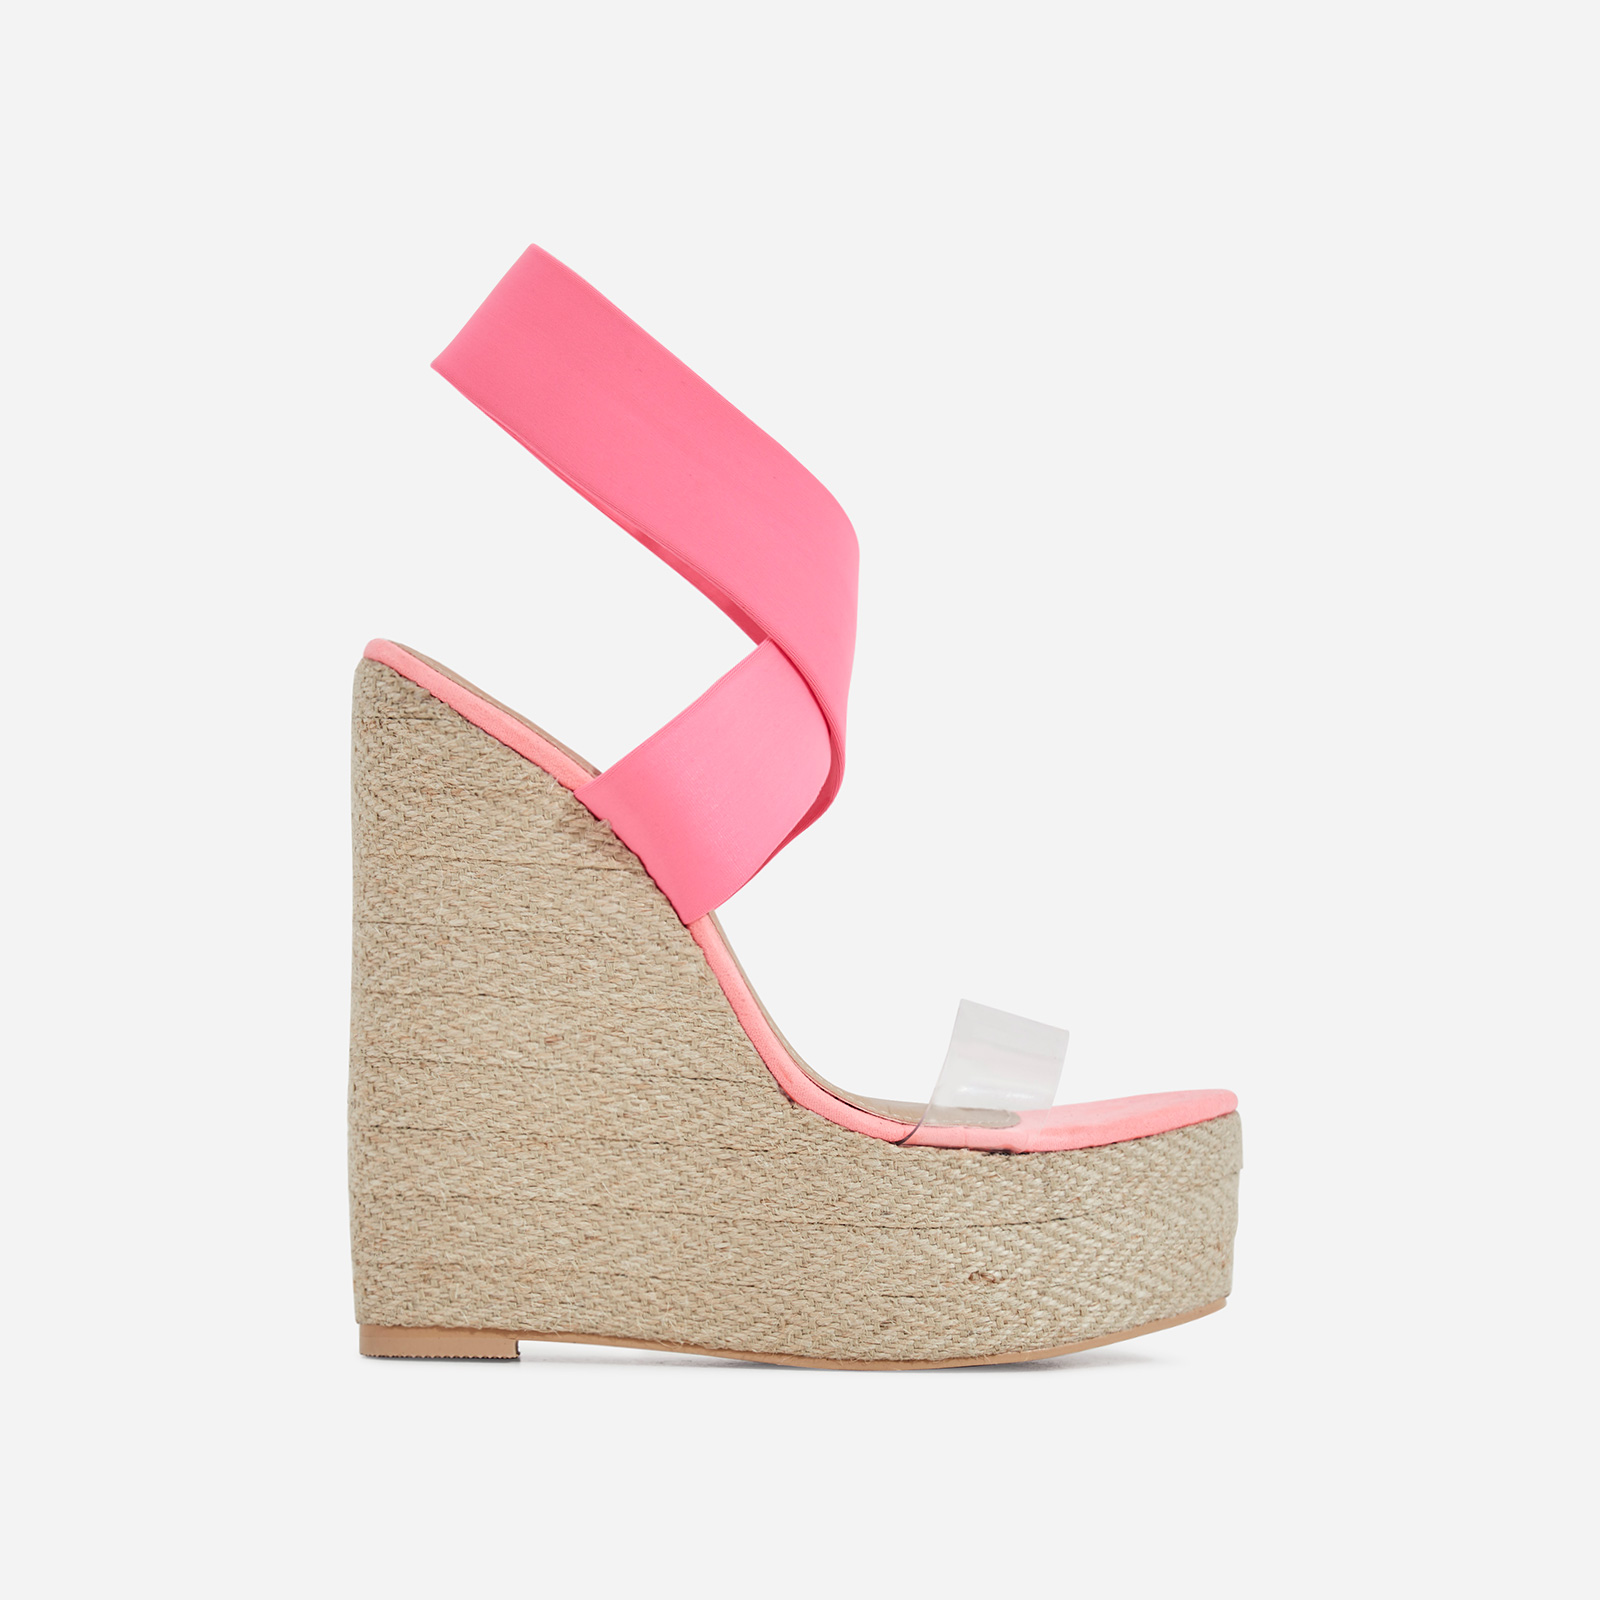 Bailey Perspex Platform Elasticated Espadrille Wedge Block Heel In Neon Pink Faux Suede